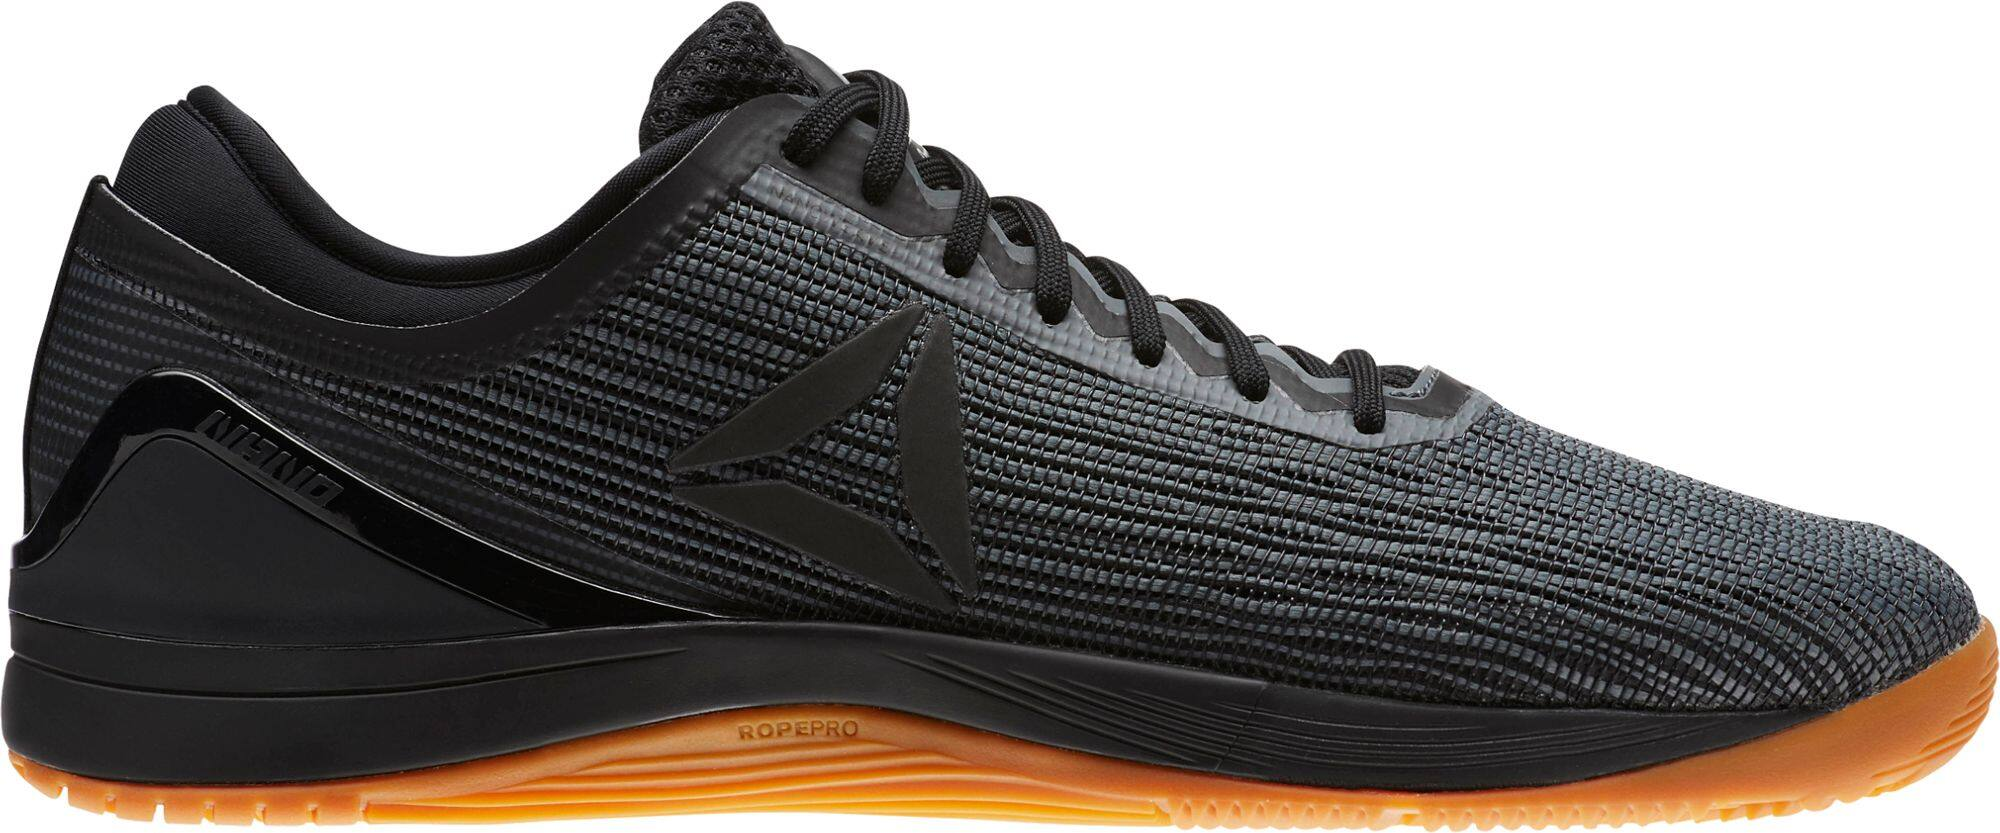 3018be0b2e Reebok Men s CrossFit Nano 8.0 Flexweave Training Shoes  30 ...